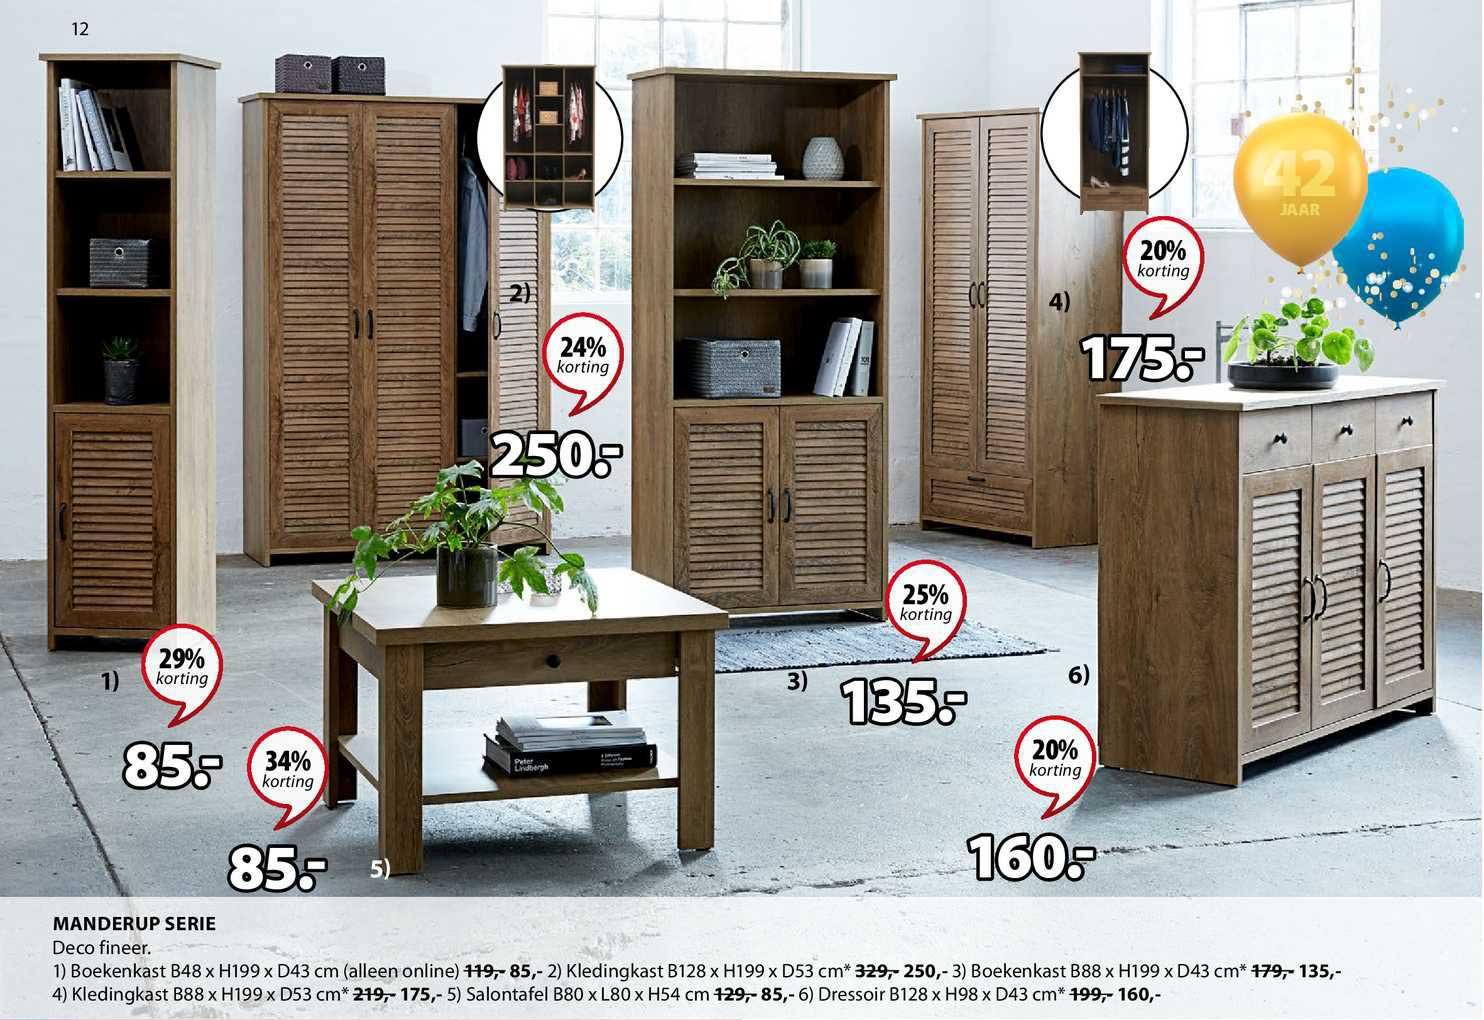 Jysk Manderup Serie : Boekenkast, Kledingkast, Salontafel Of Dressoir 20% - 34% Korting